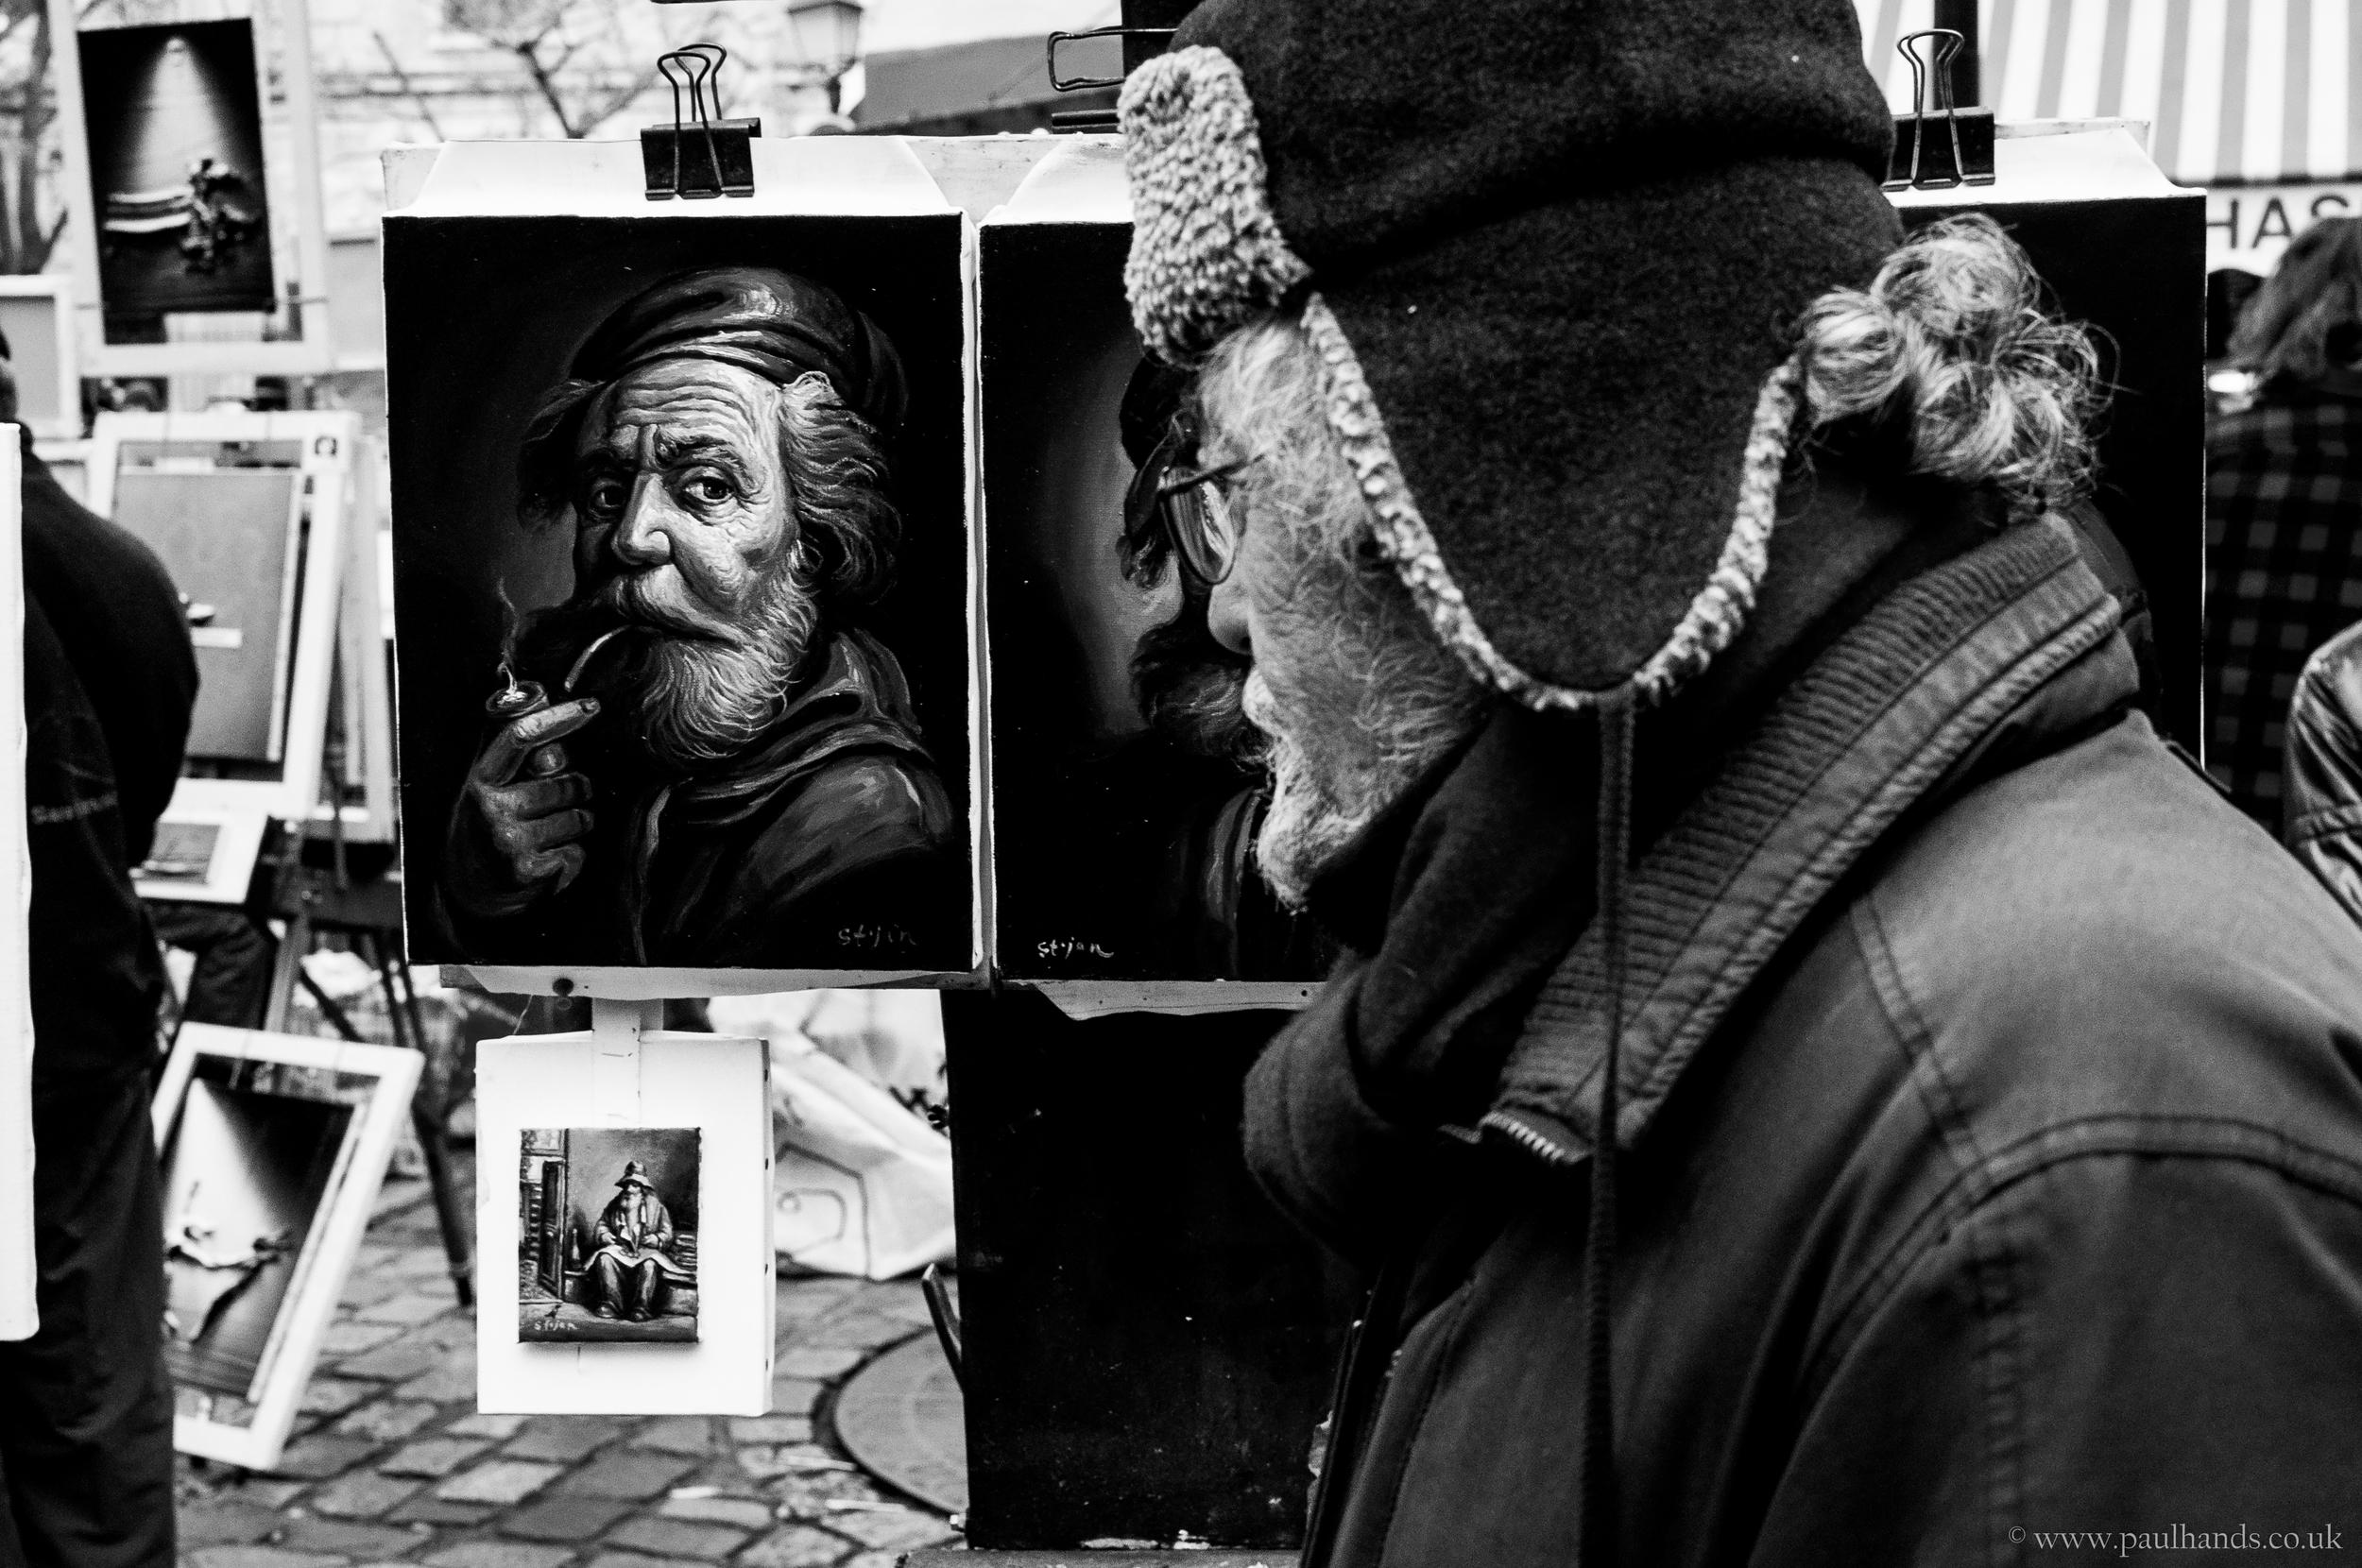 Paul Hands documentary photographer, Burbage, Hinckley, Leicestershire, Midlands, England, UK